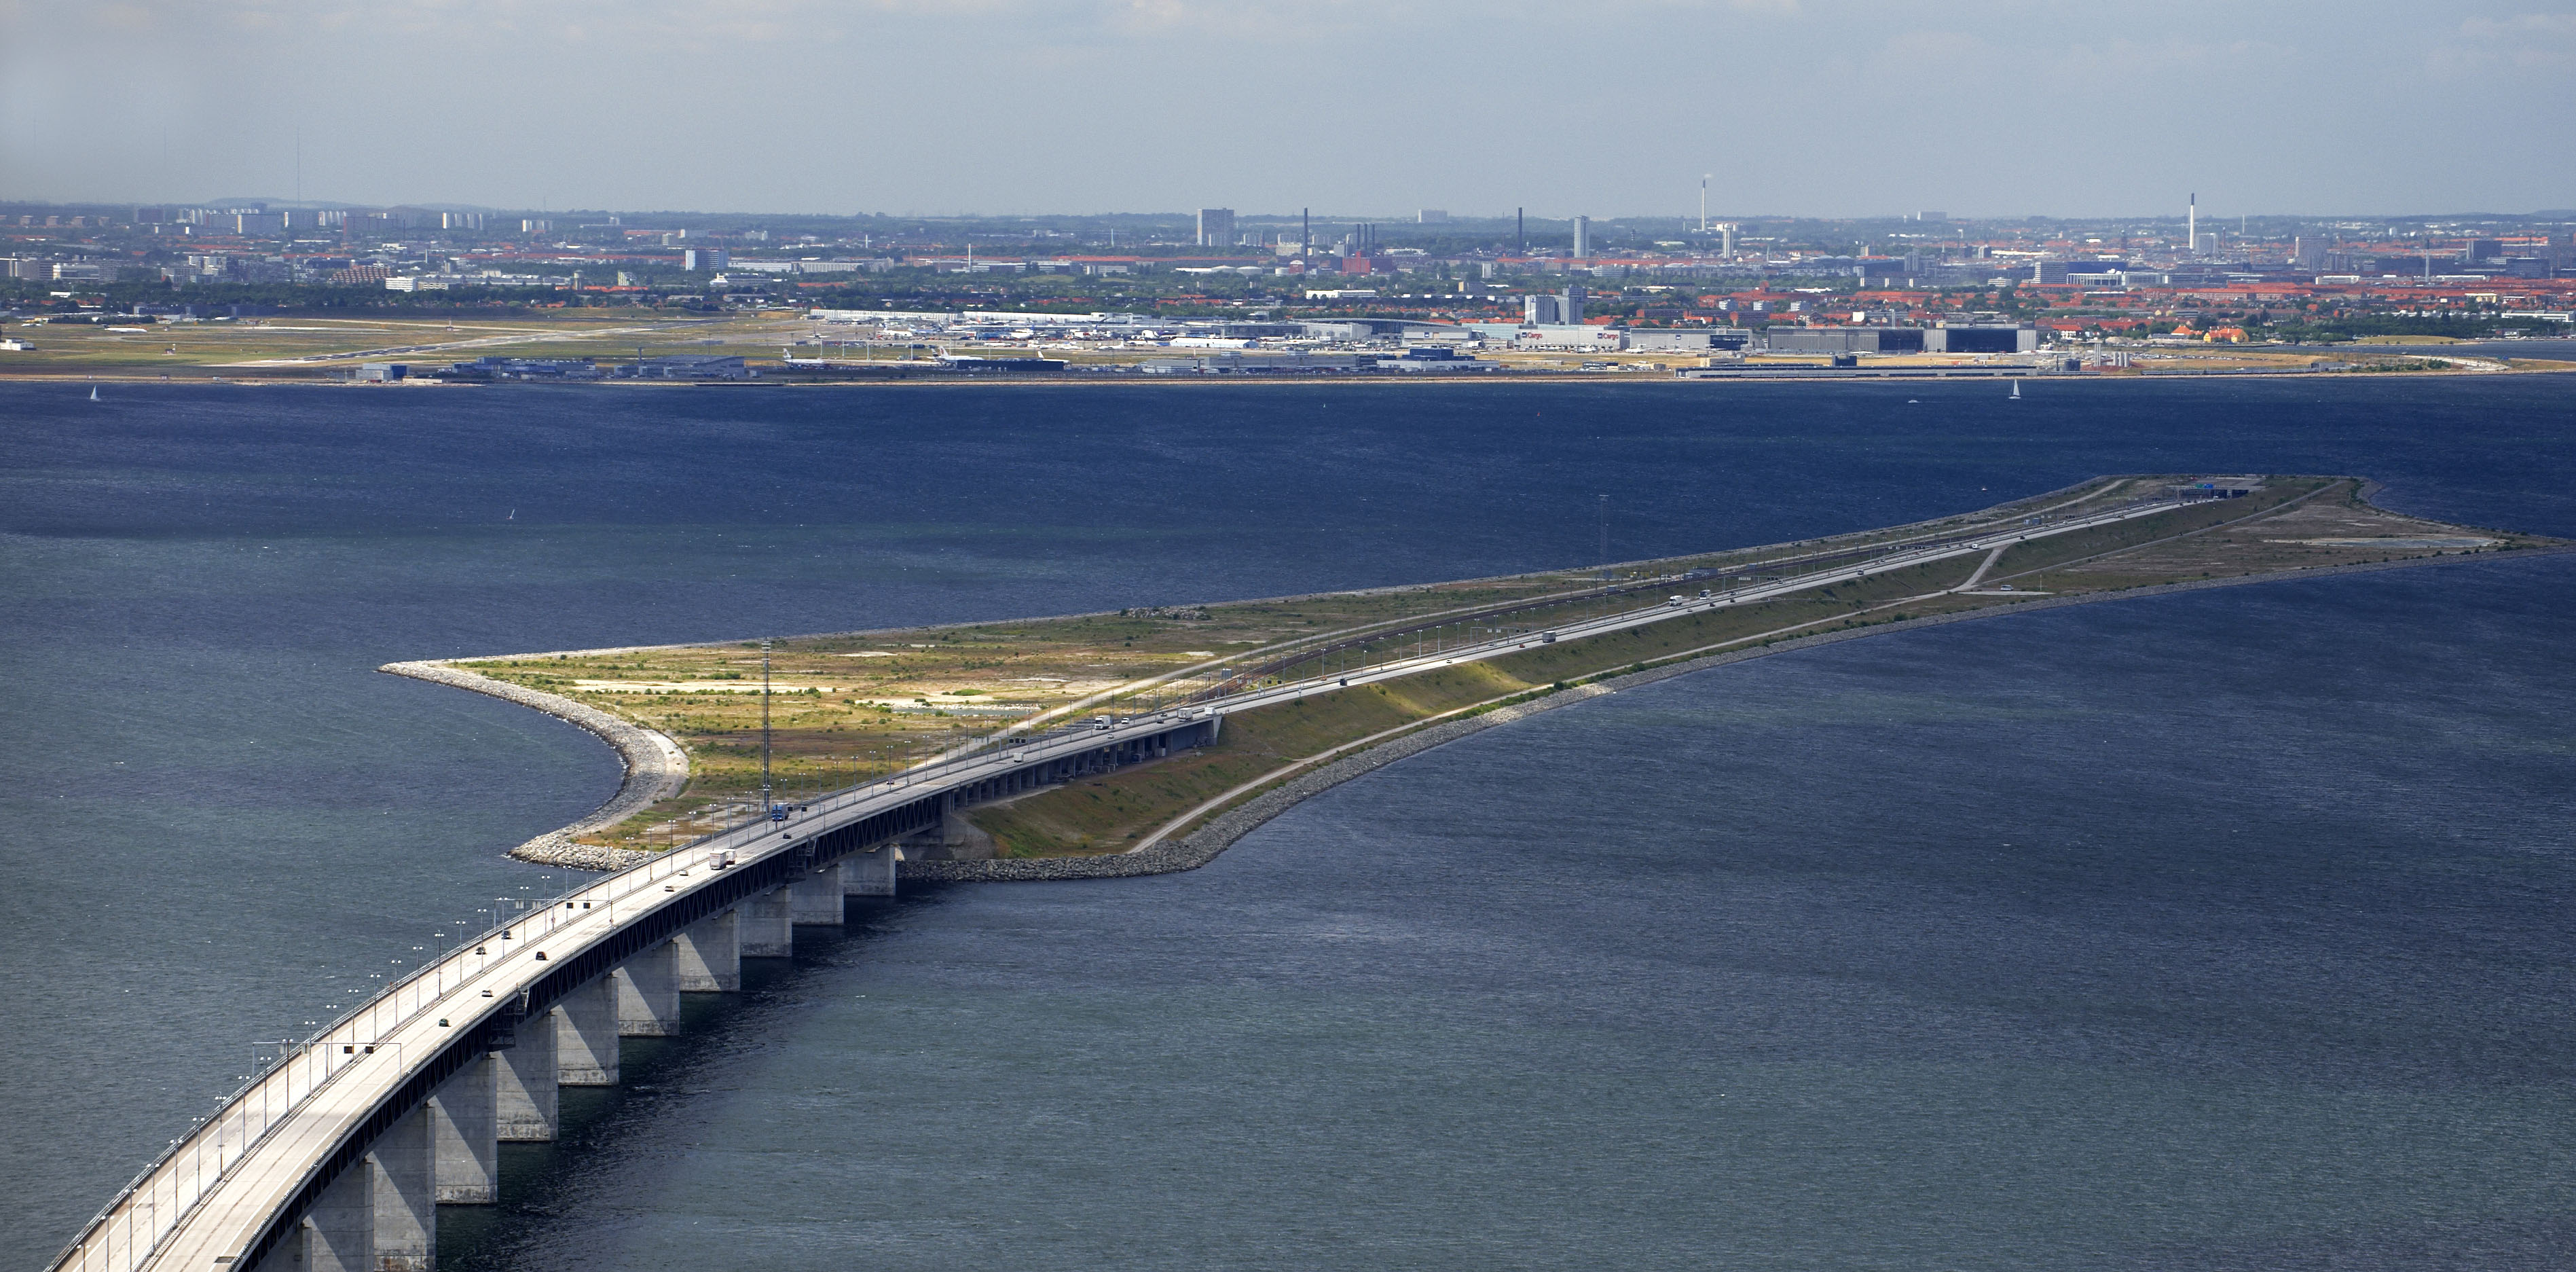 bro til sverige